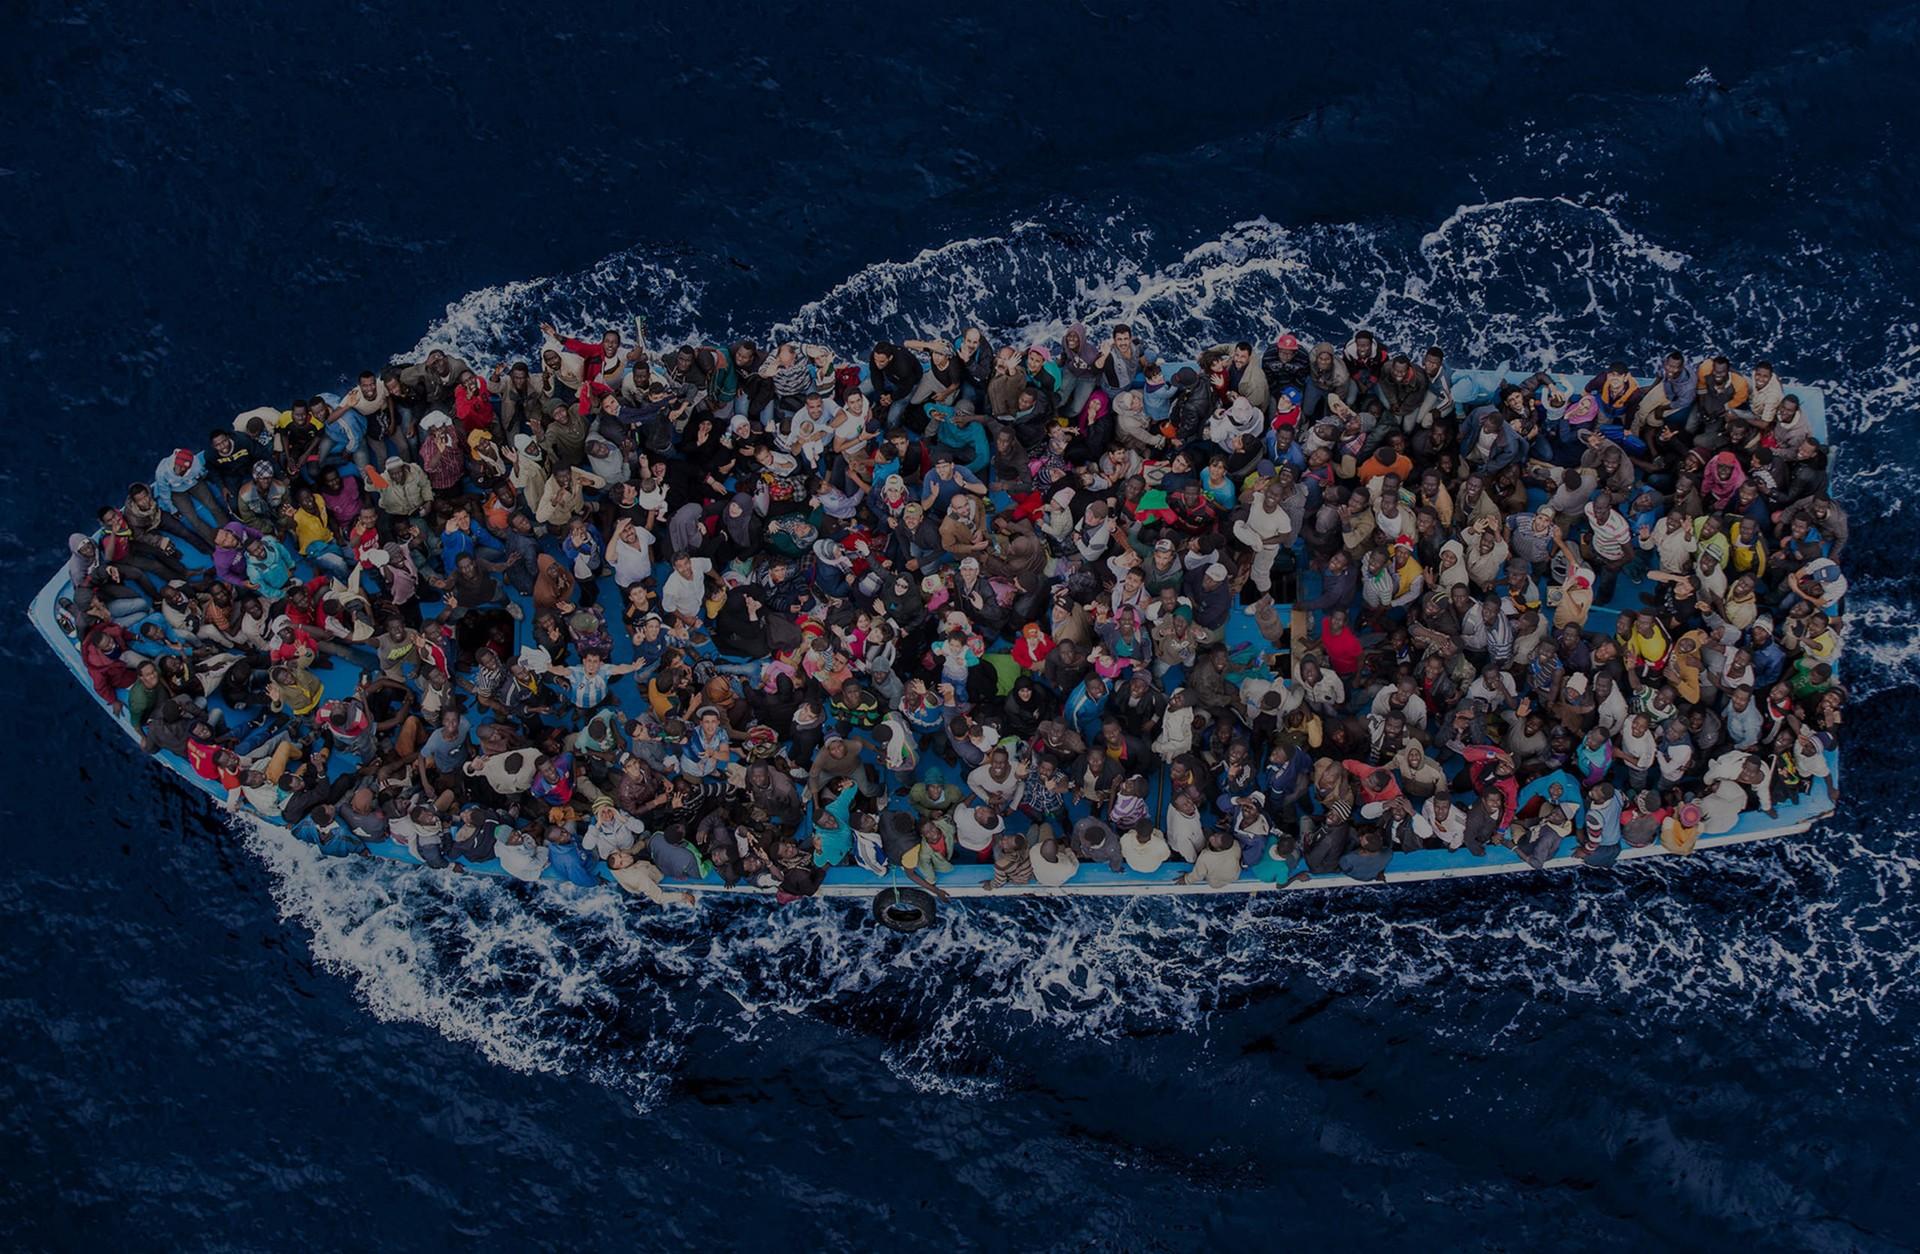 Scotland Welcomes Refugees